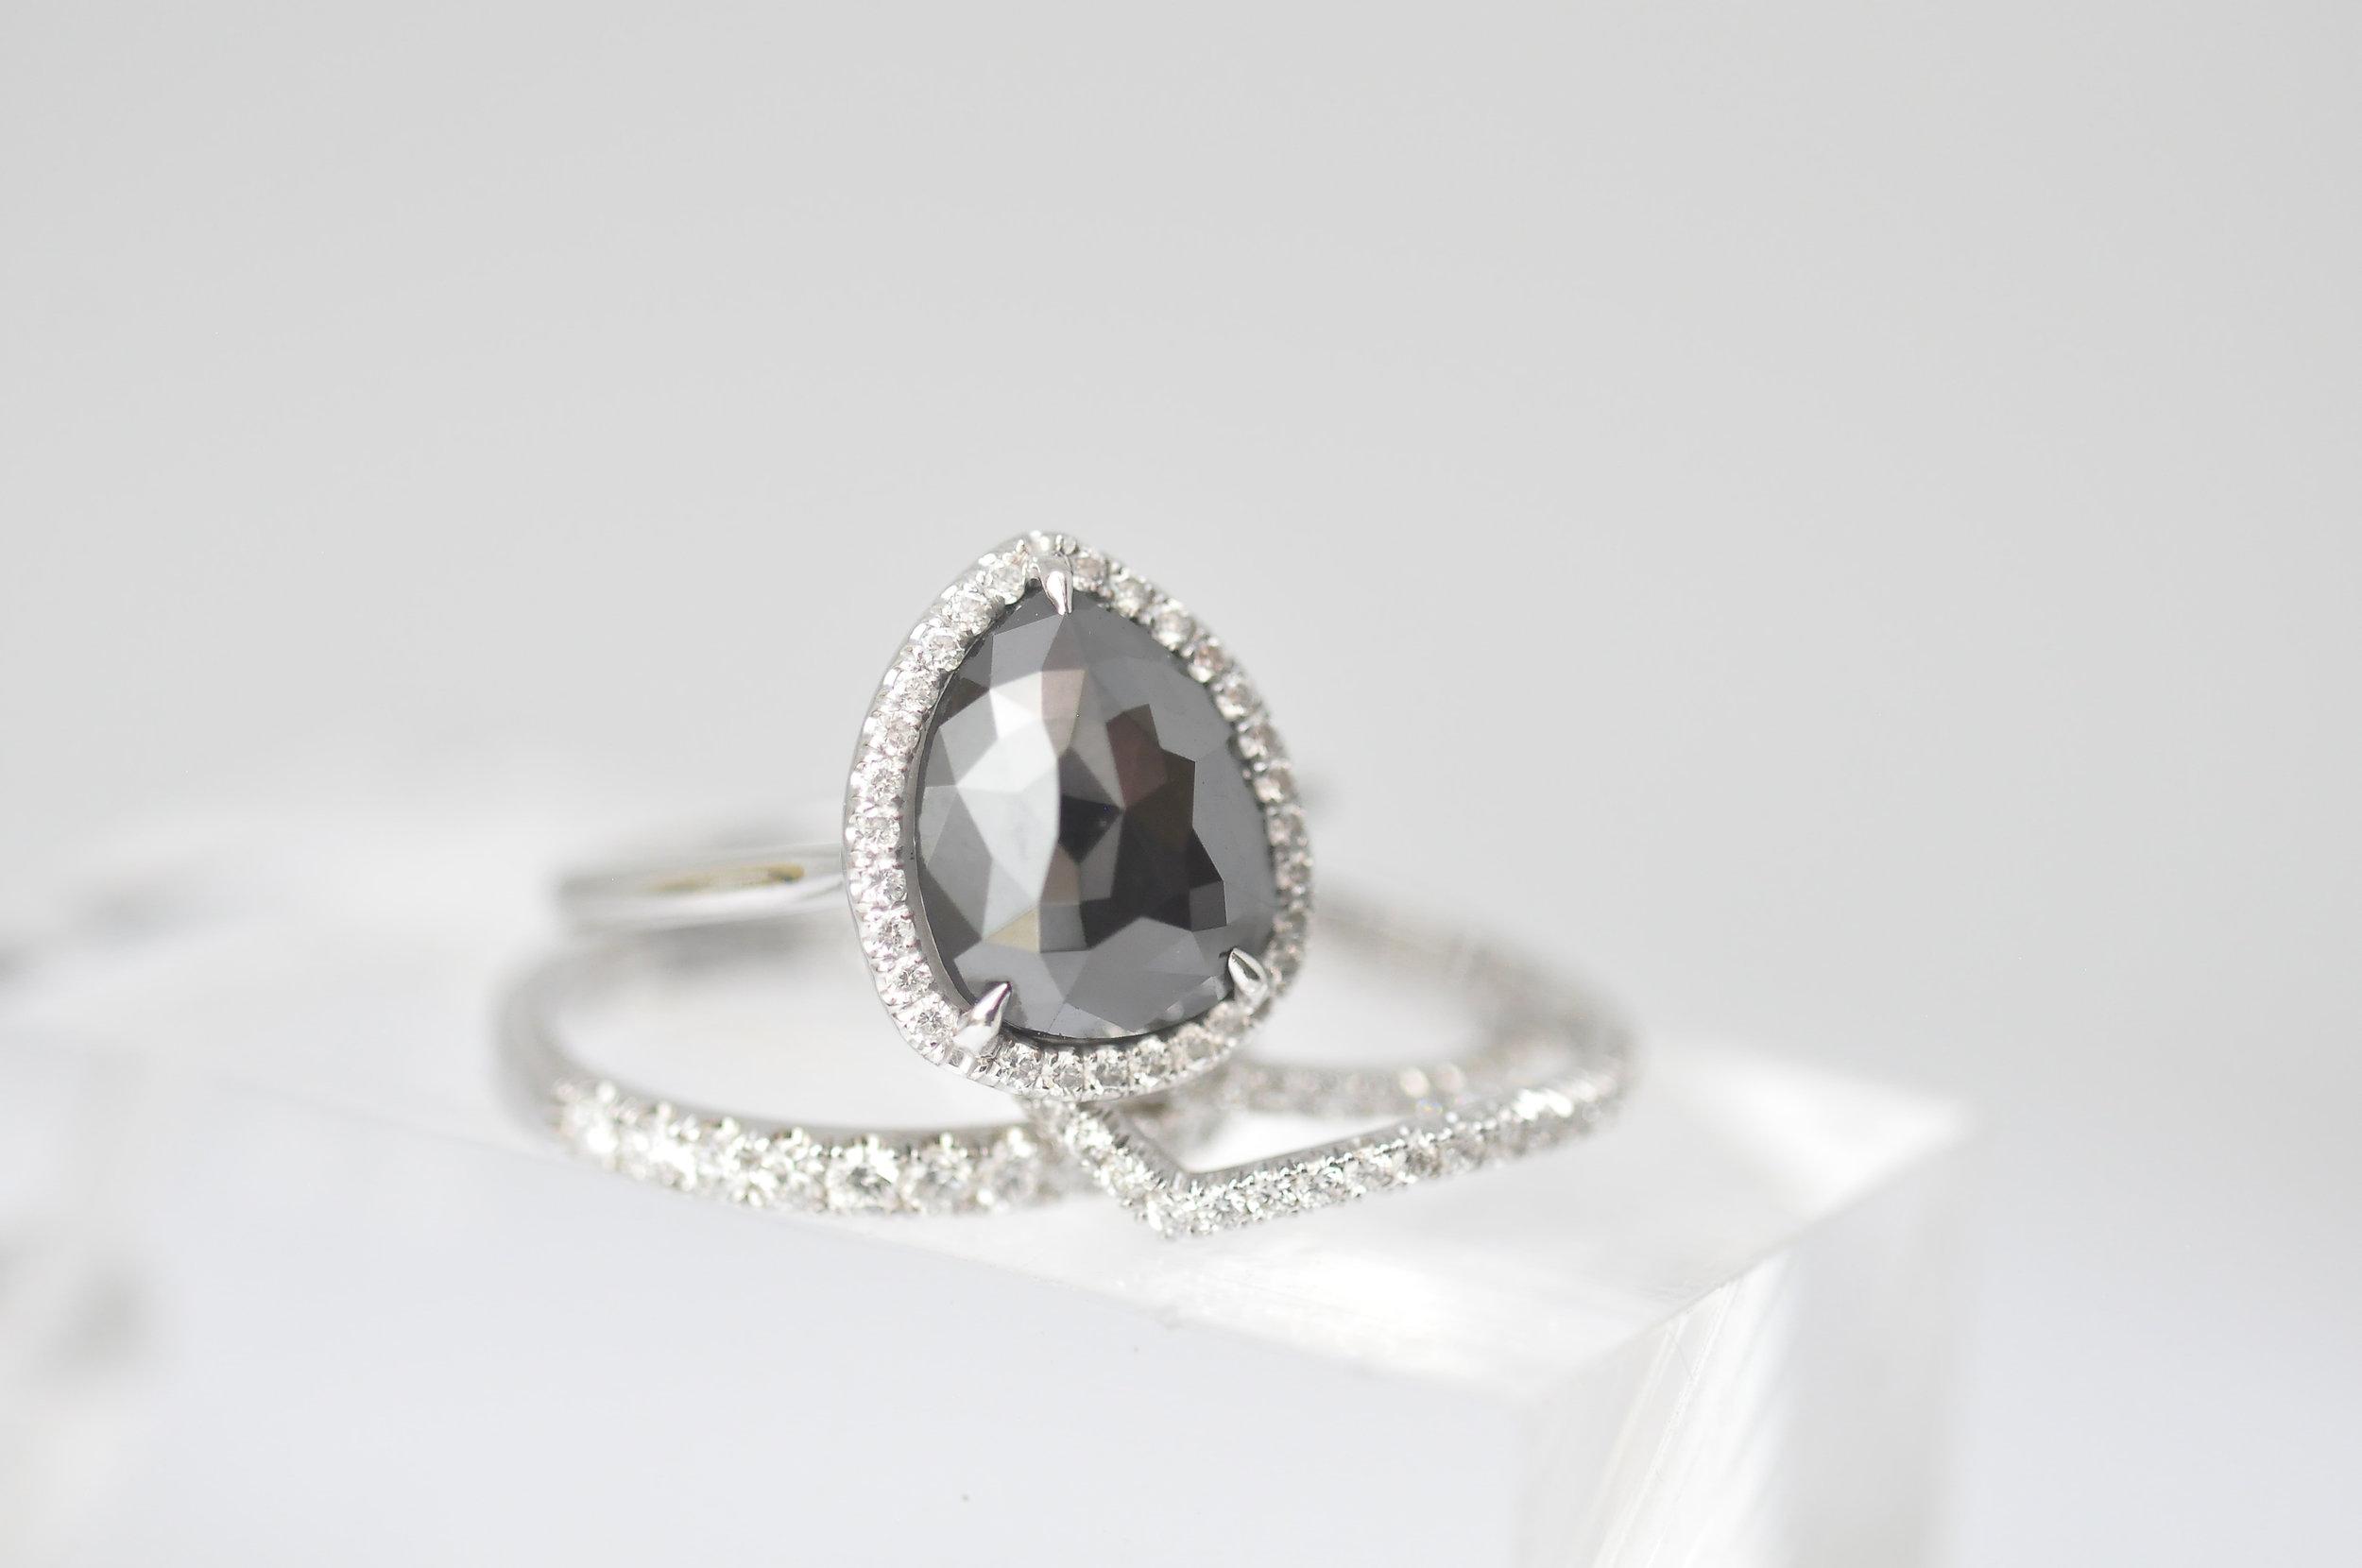 Black Diamond Engagement Ring Toronto.jpg